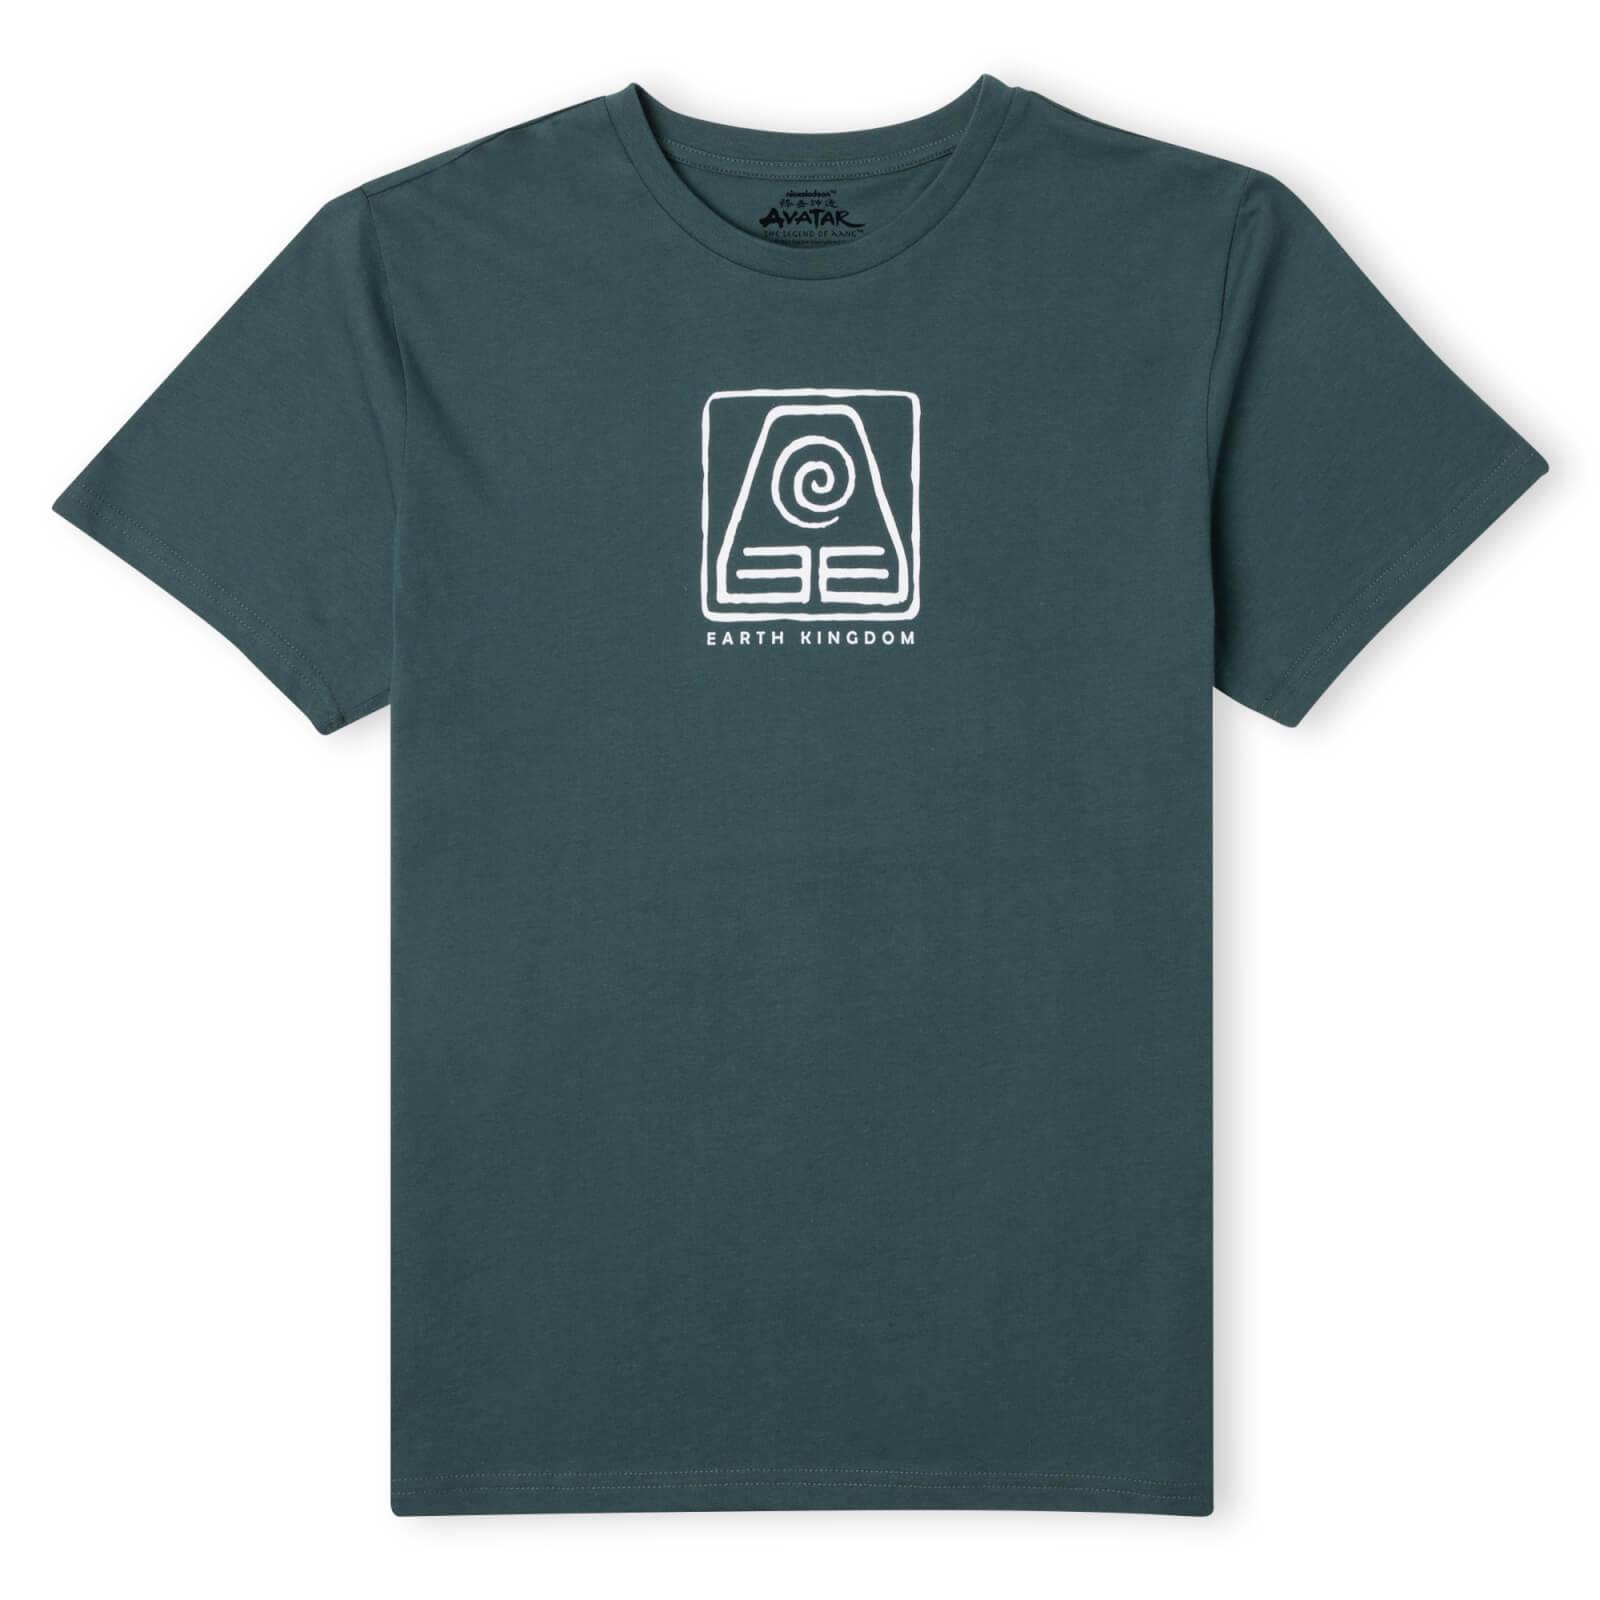 Avatar Earth Kingdom Unisex T-Shirt - Green - M